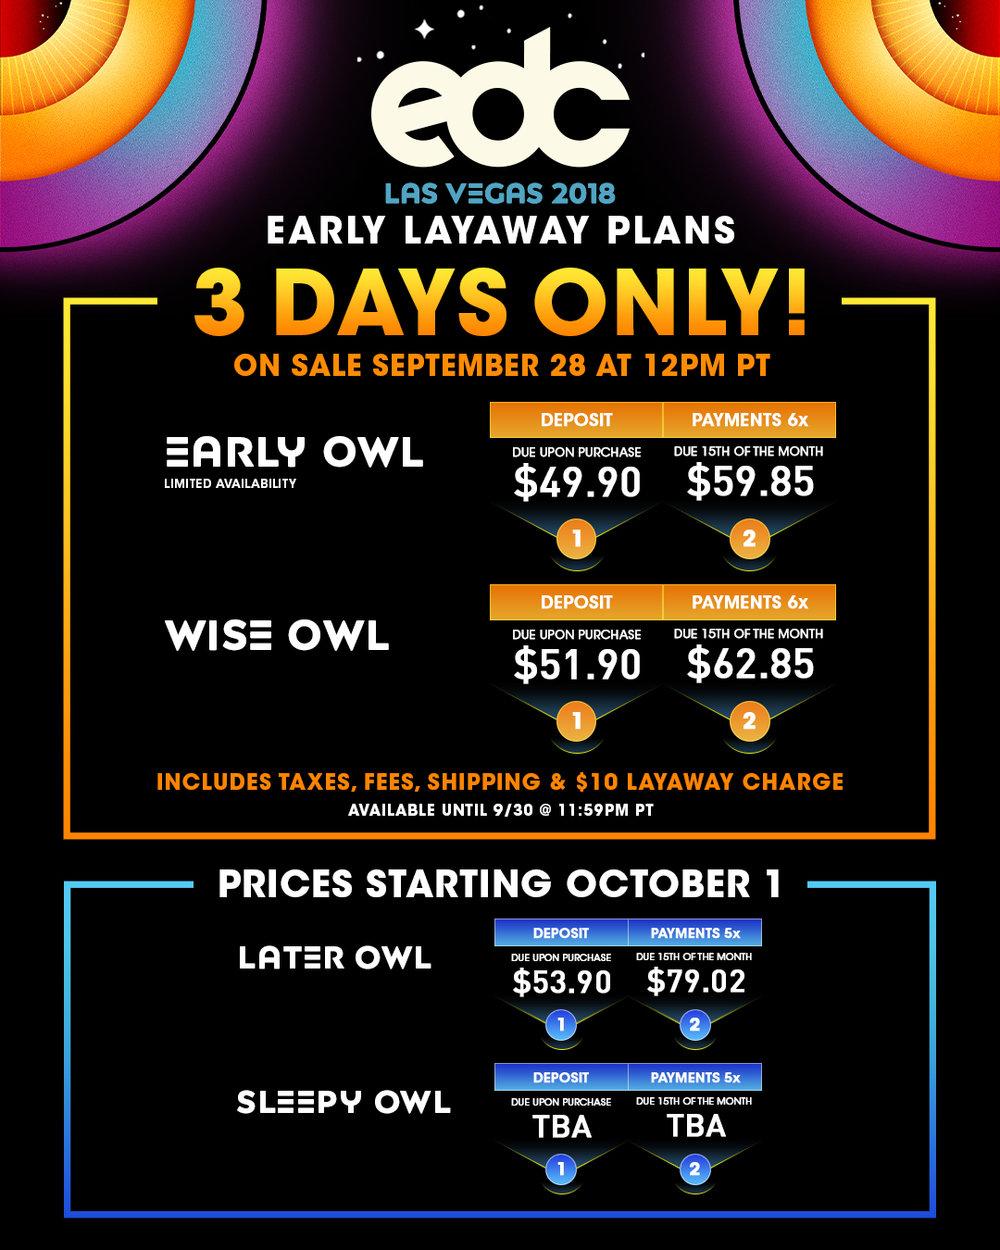 edc_las_vegas_2018_os_layaway_plan_festival_tickets_all_tiers_1080x1350_r09.jpg